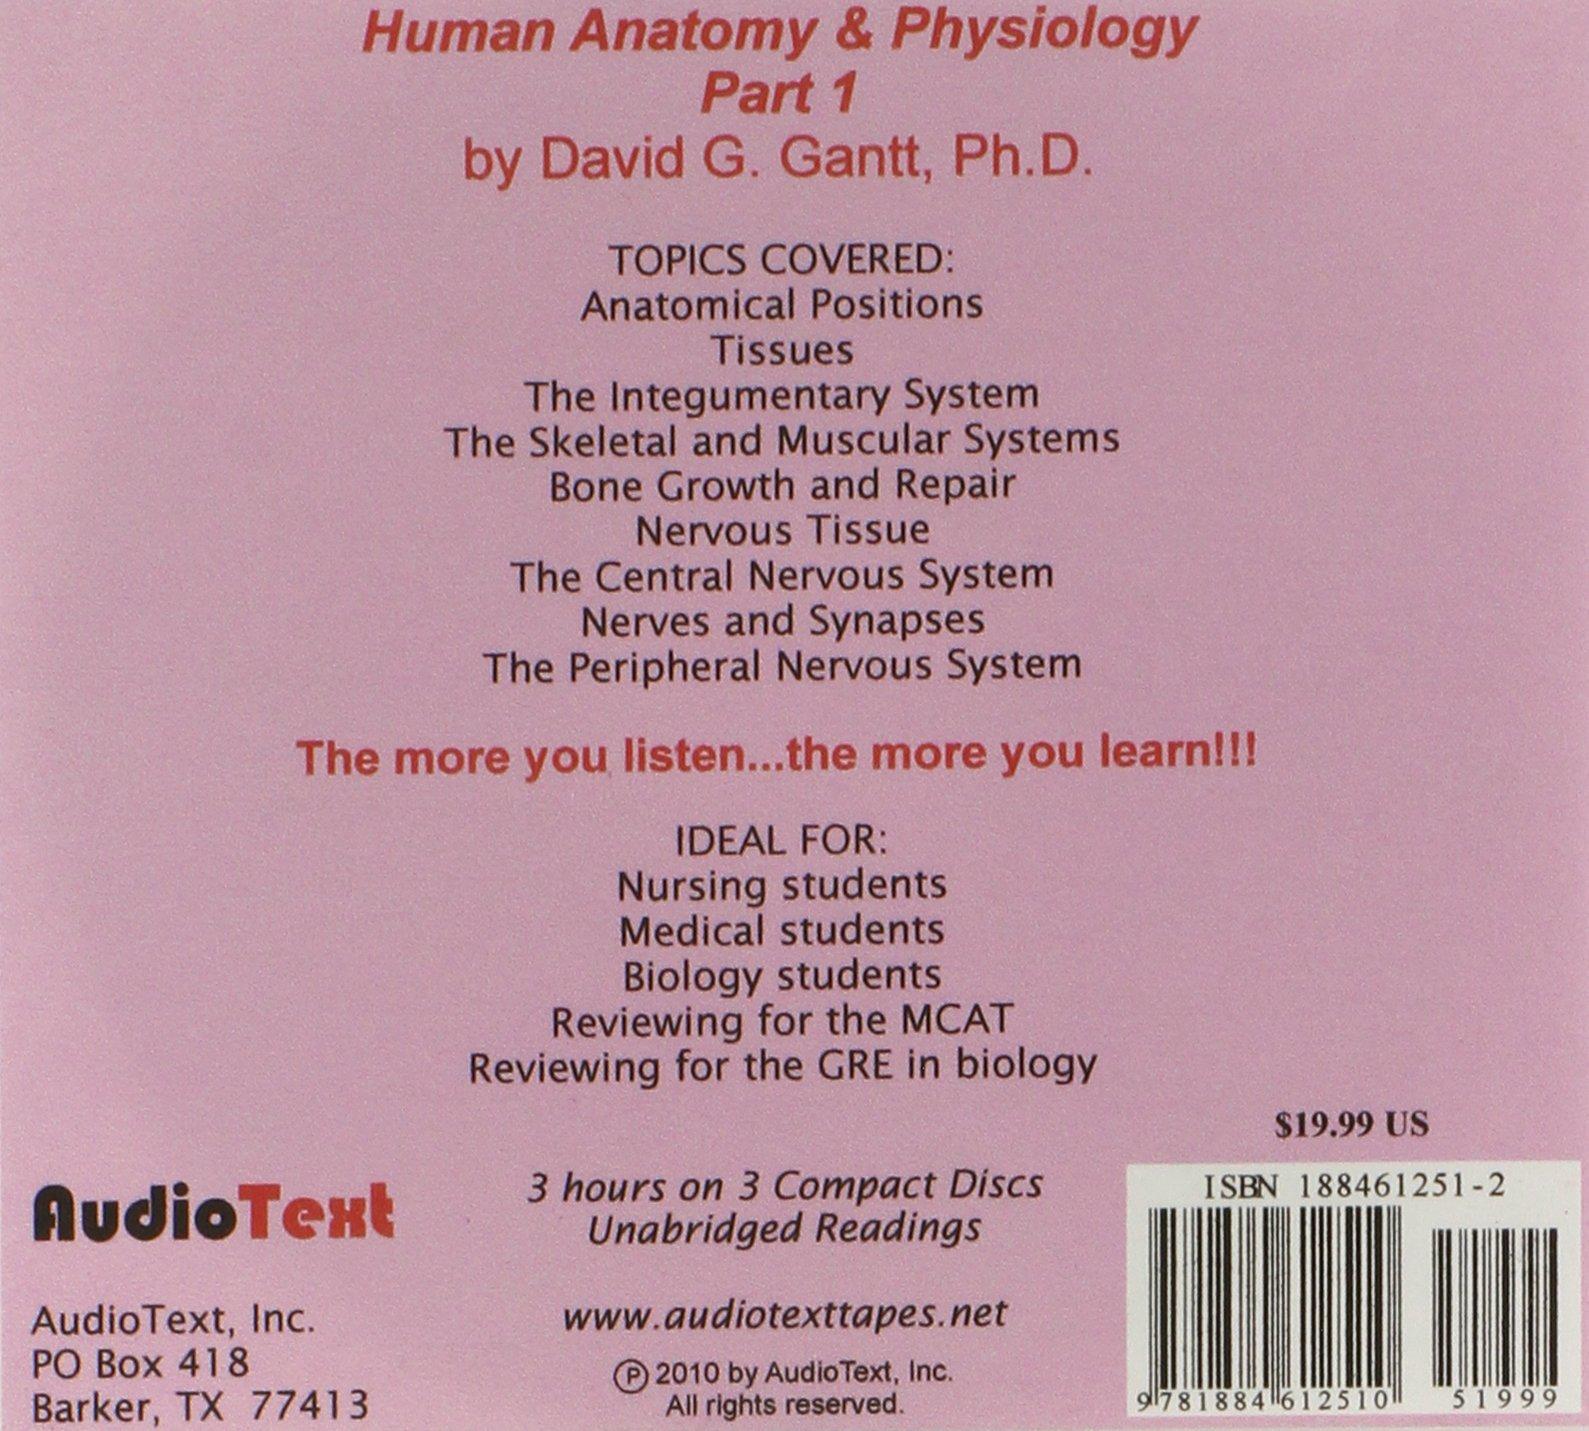 Human Anatomy & Physiology (Biology-on-disc): Amazon.co.uk: David G ...